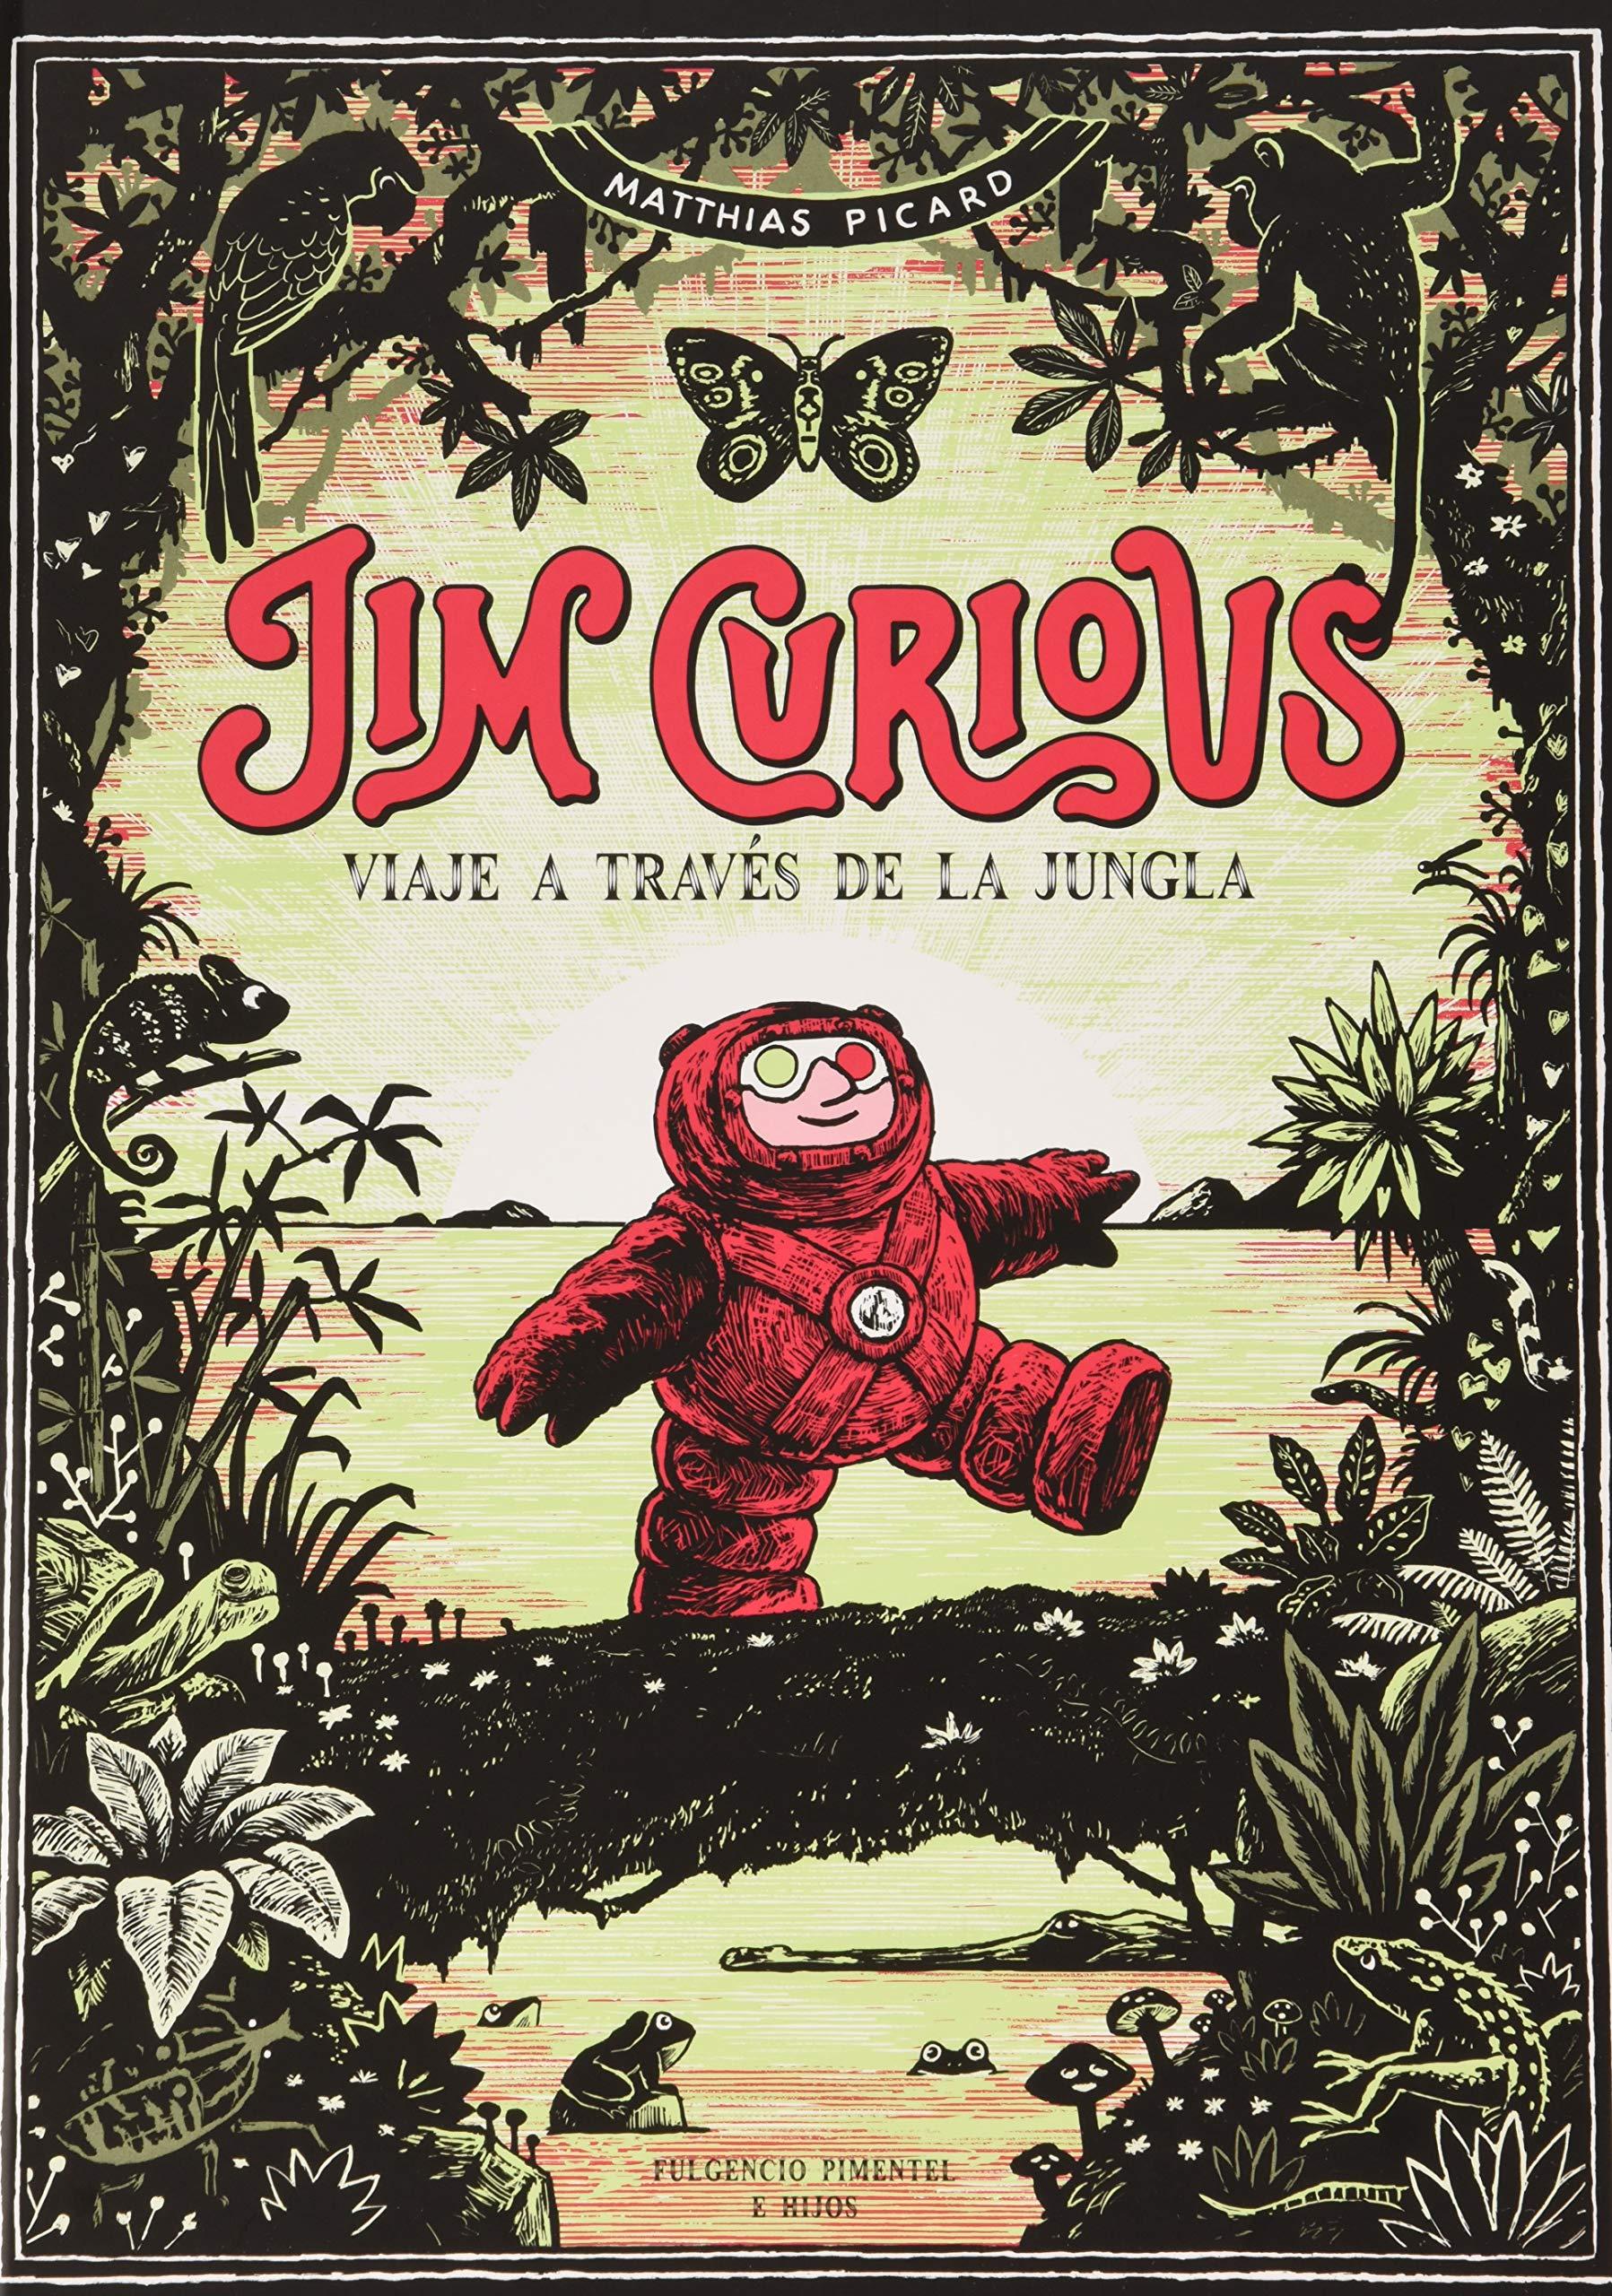 Jim Curious: Viaje a través de la jungla: 27 Fulgencio Pimentel e Hijos: Amazon.es: Picard, Matthias: Libros